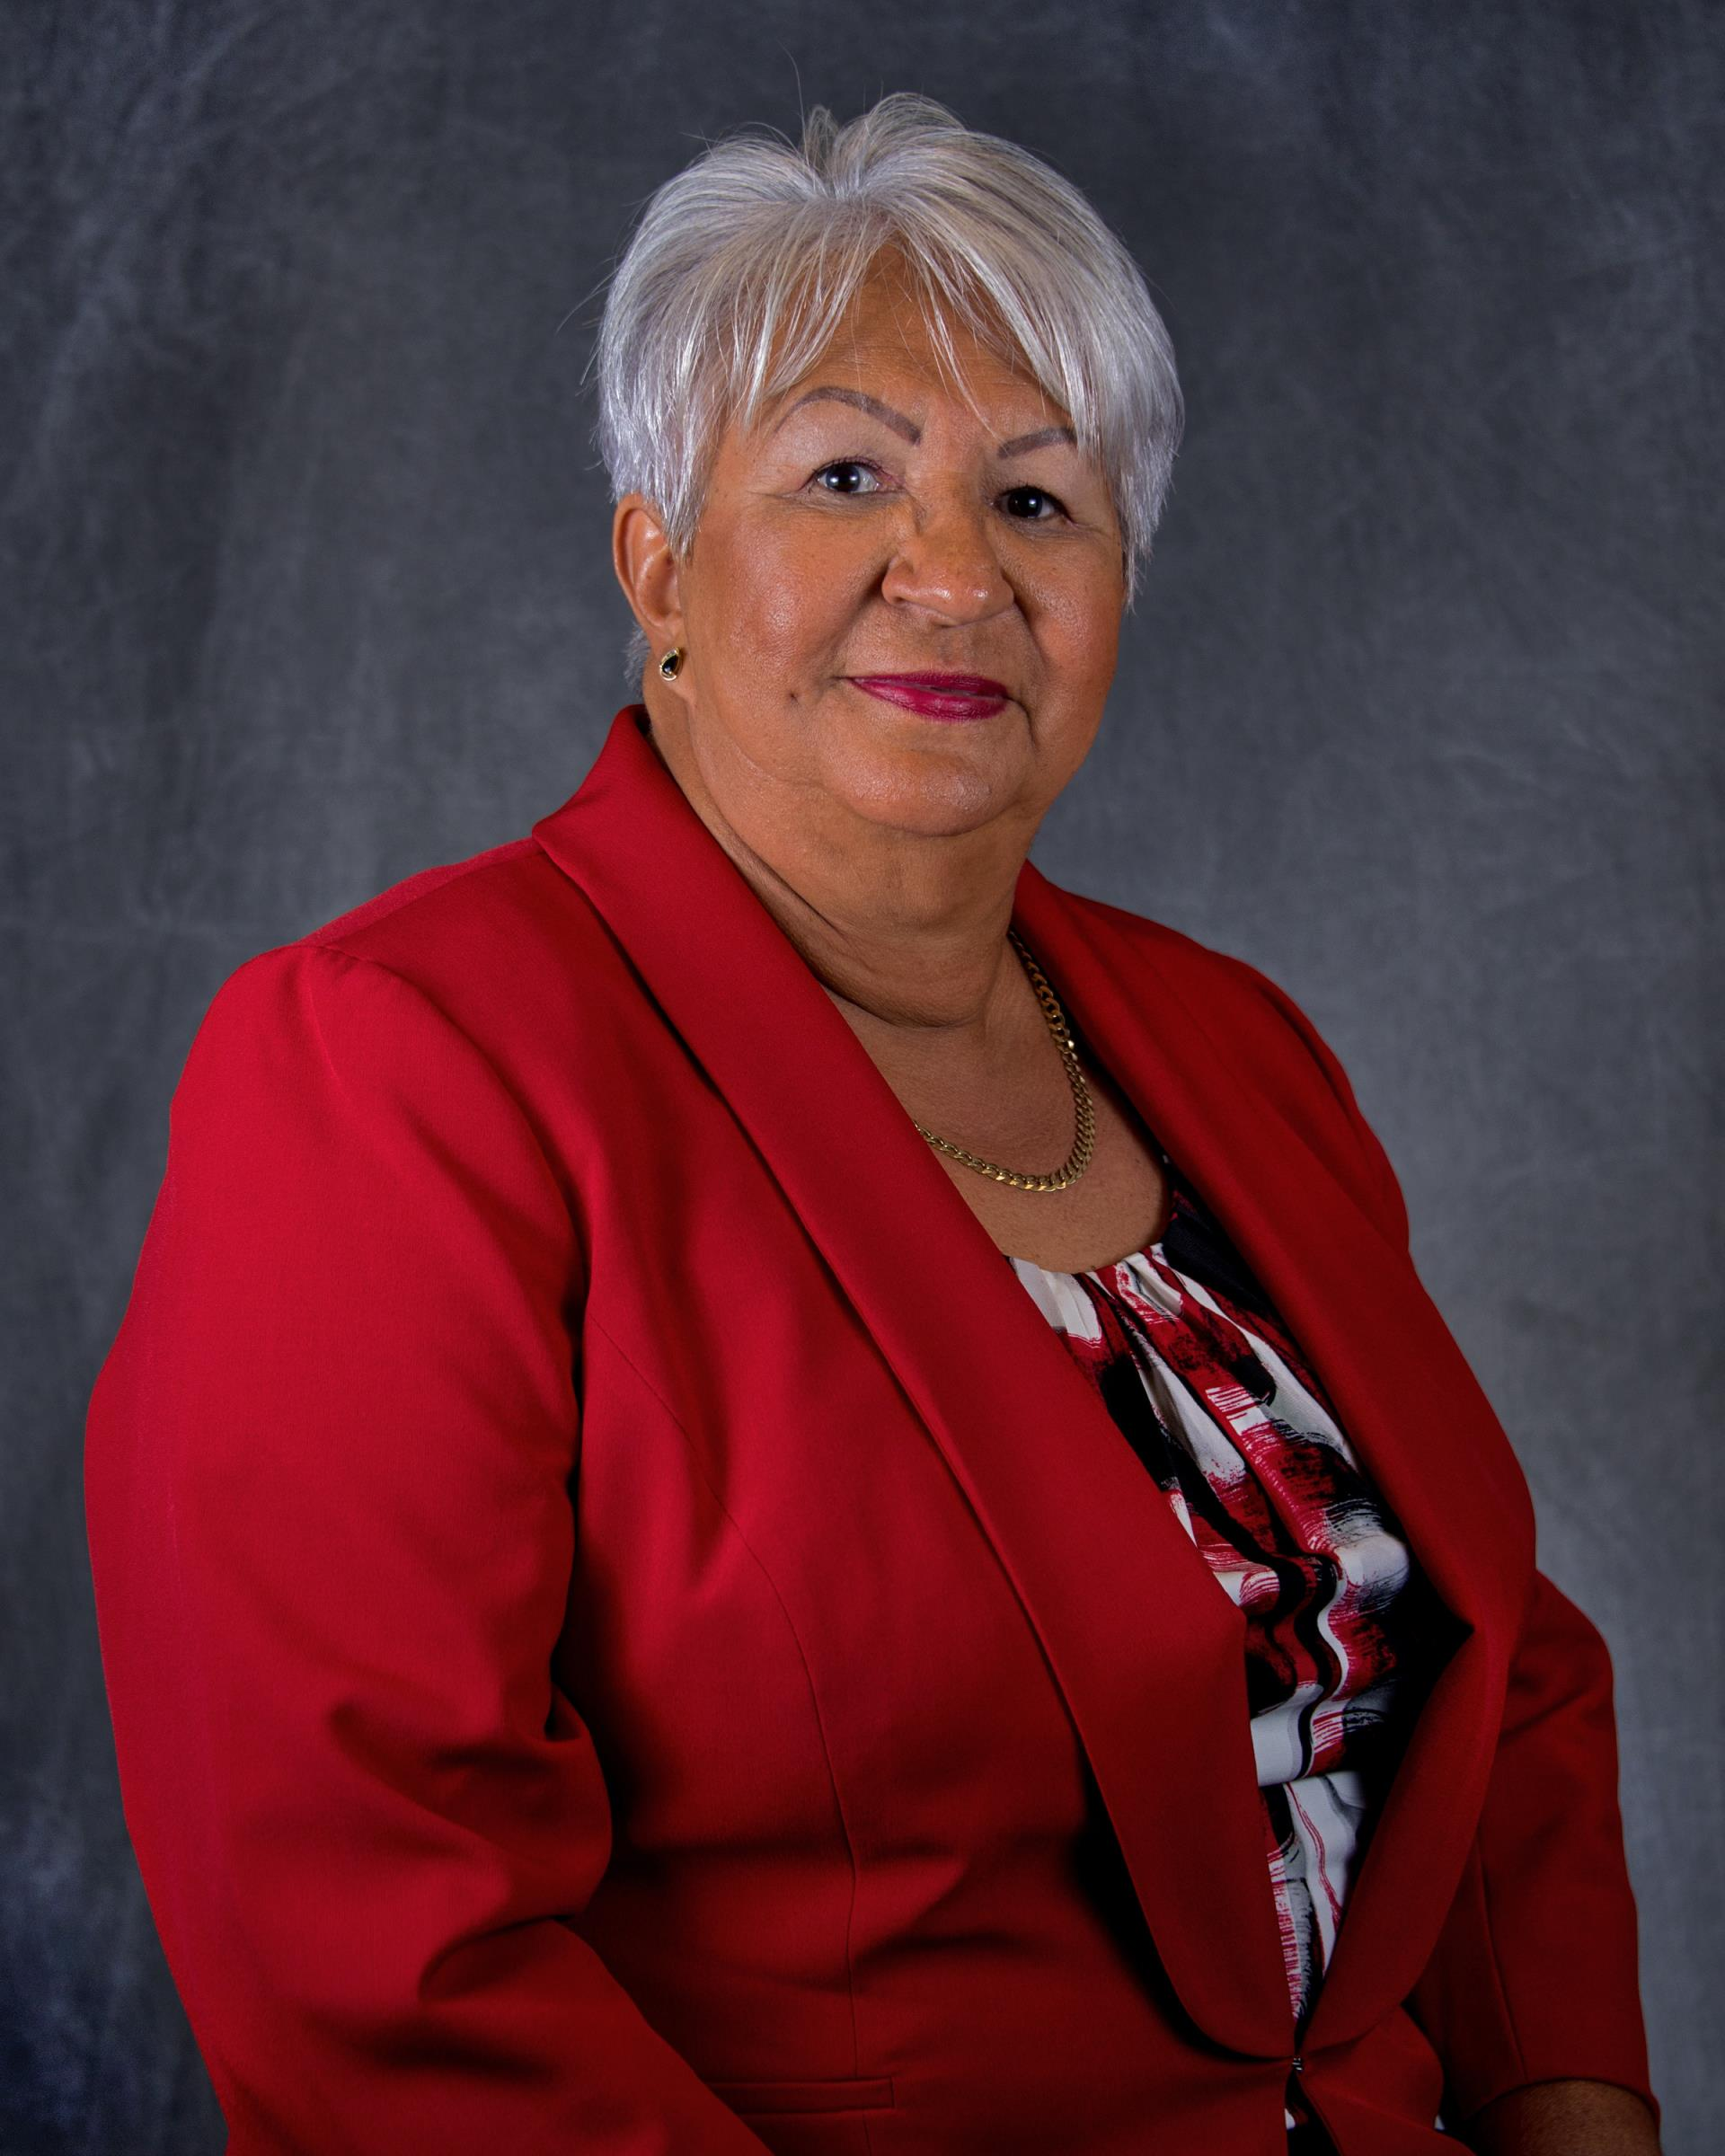 Commissioner-Elect Olga Gonzalez